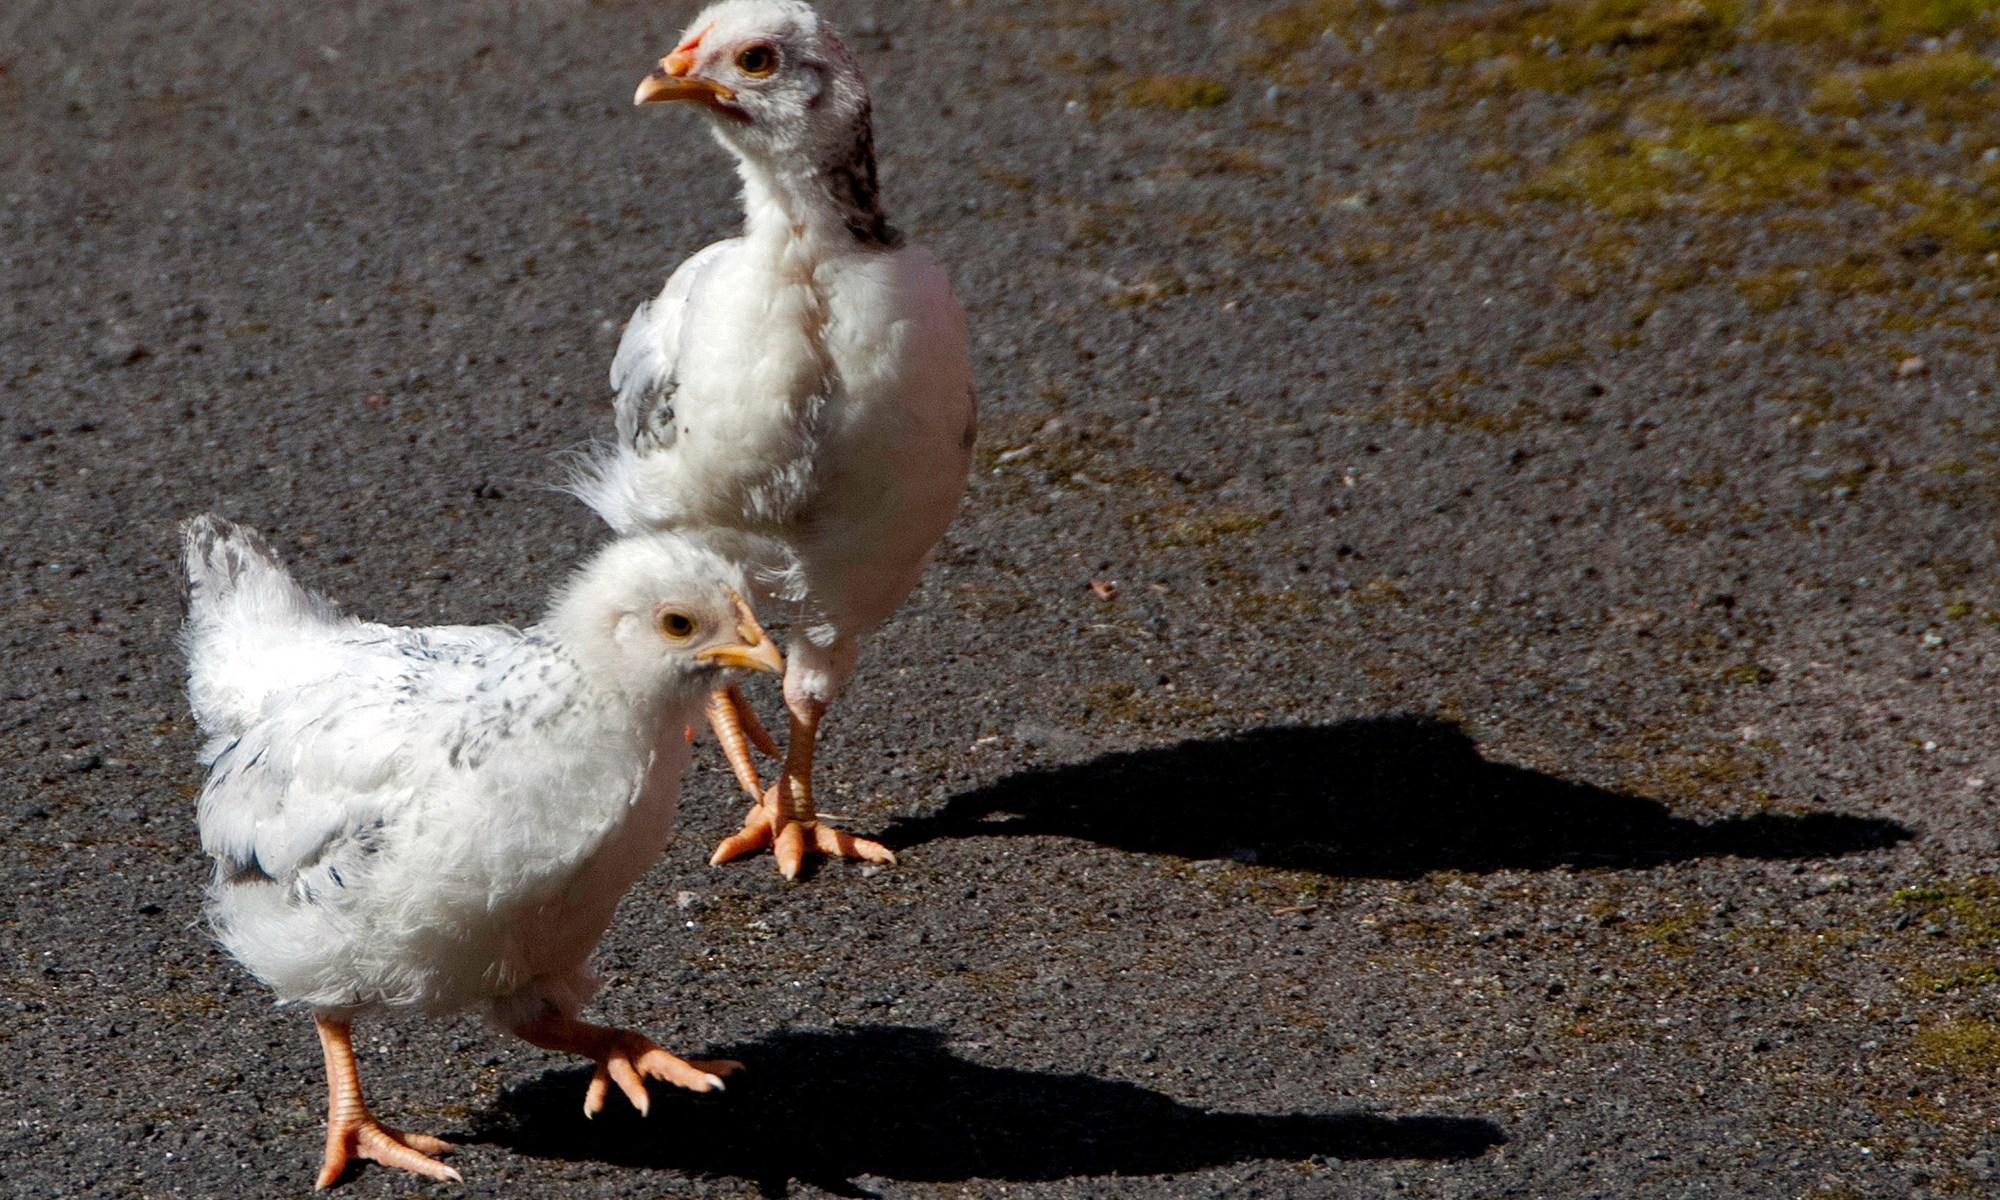 Bantam Chicks